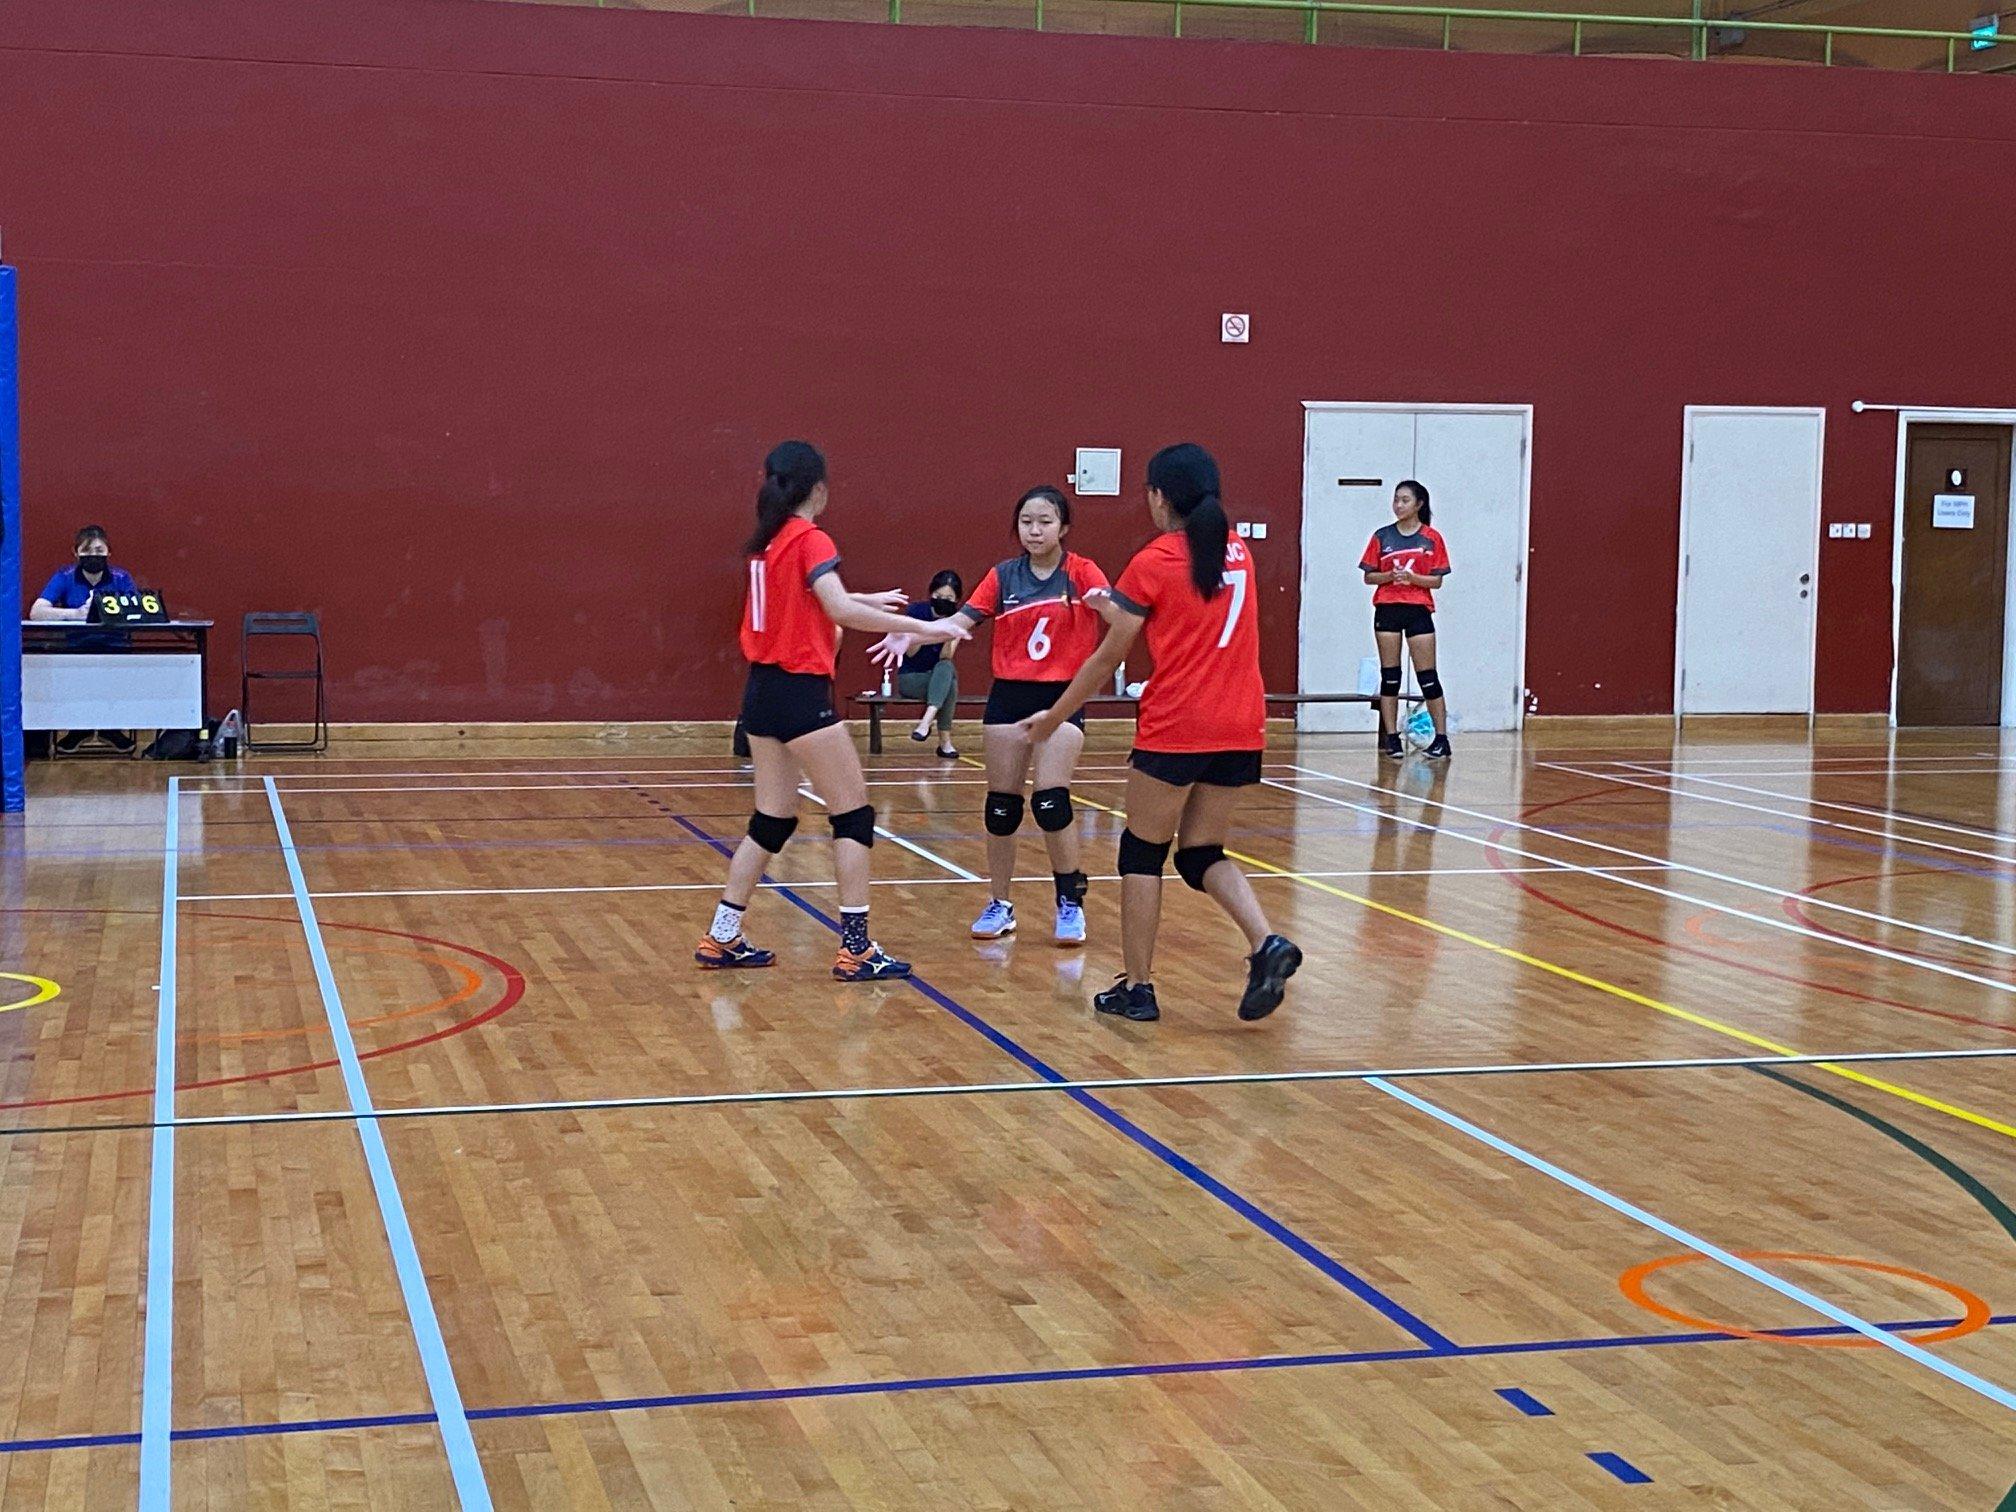 NSG A Div girls' volleyball prelim rd - ACJC (red) vs TJC (black) 9